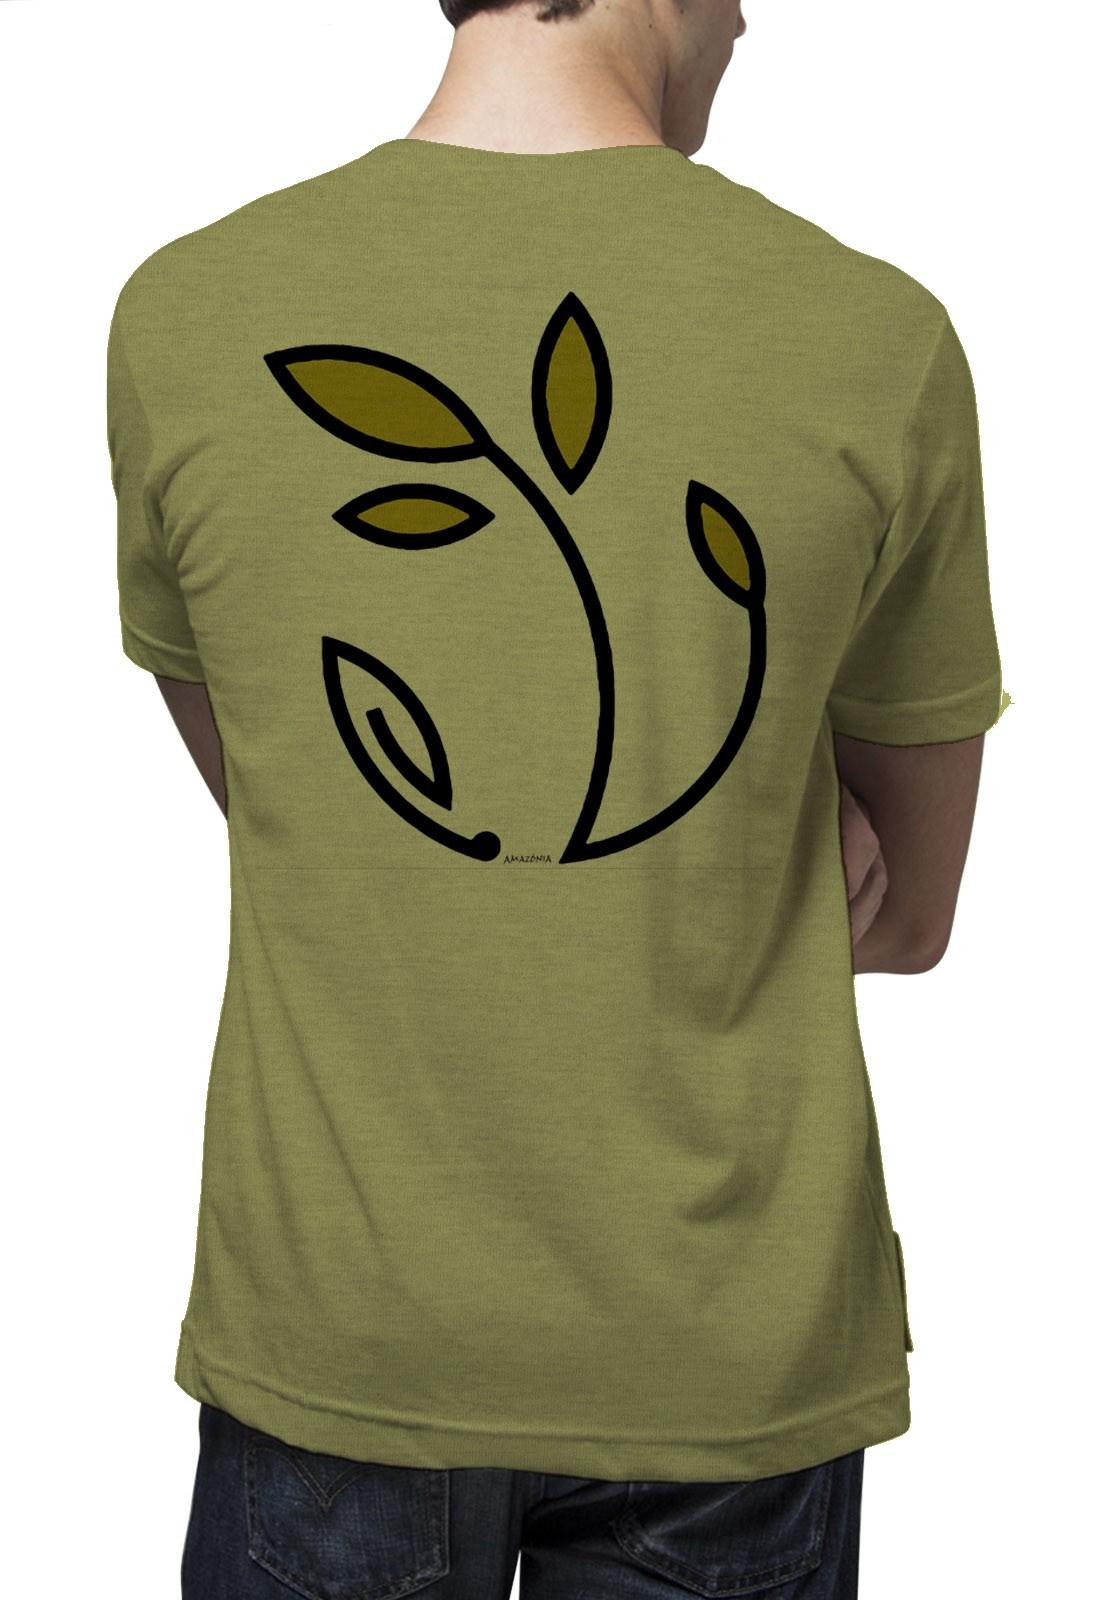 Camiseta Amazônia Eu Refloresto - Mescla Amarelo